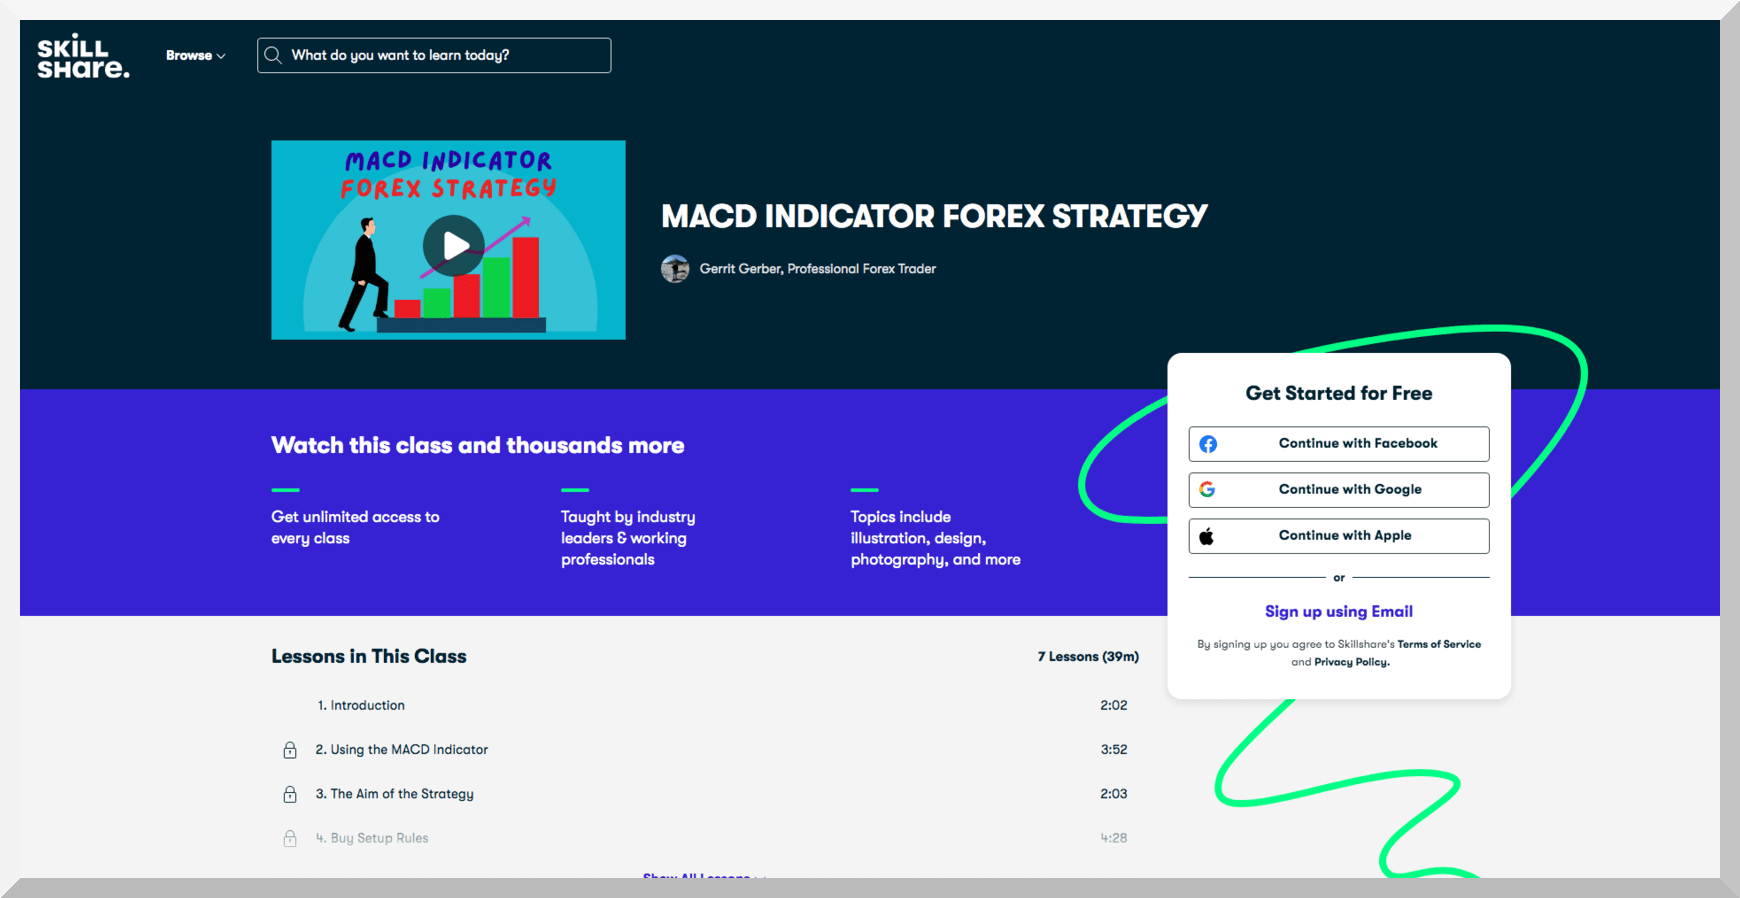 MACD Indicator Forex Strategy – Skillshare